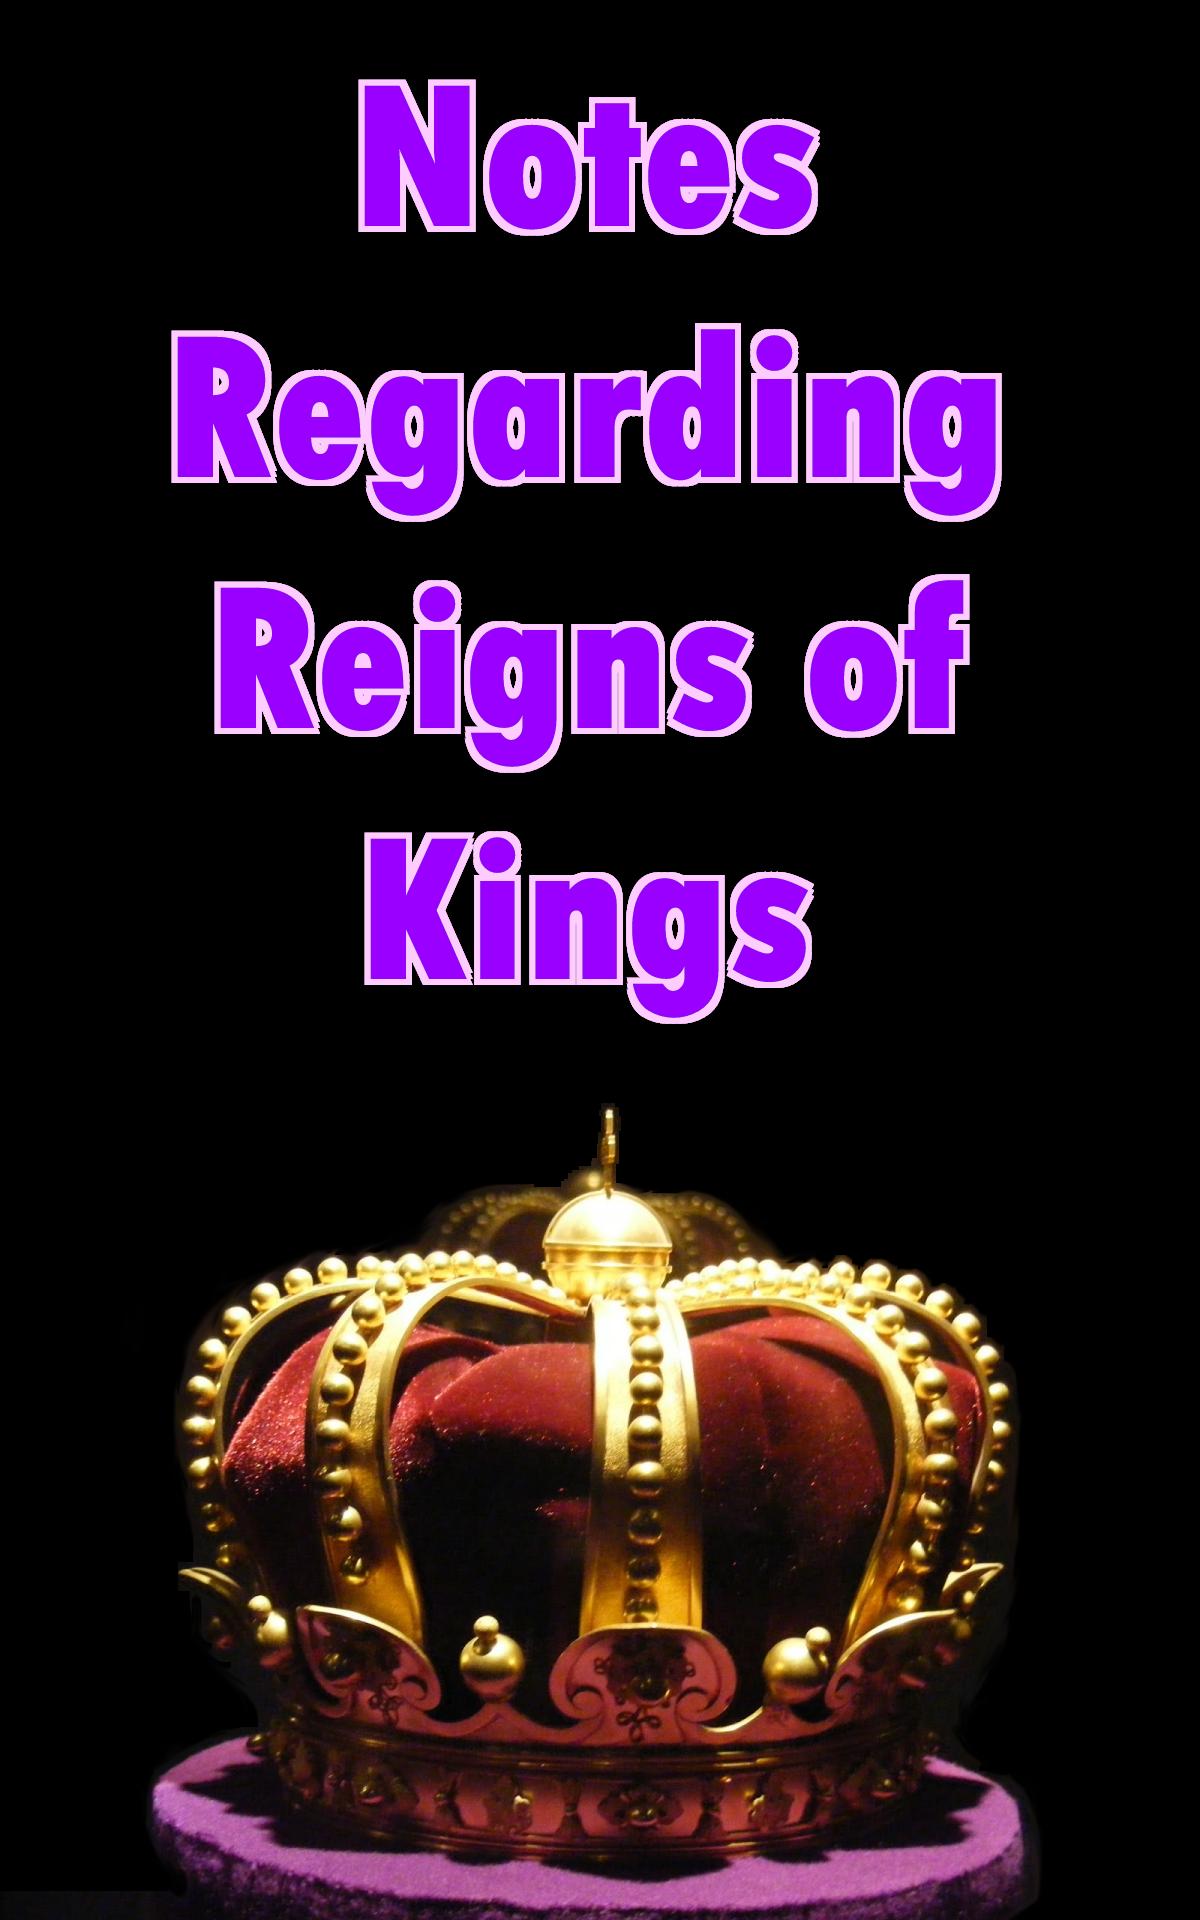 Notes Regarding Reigns of Kings